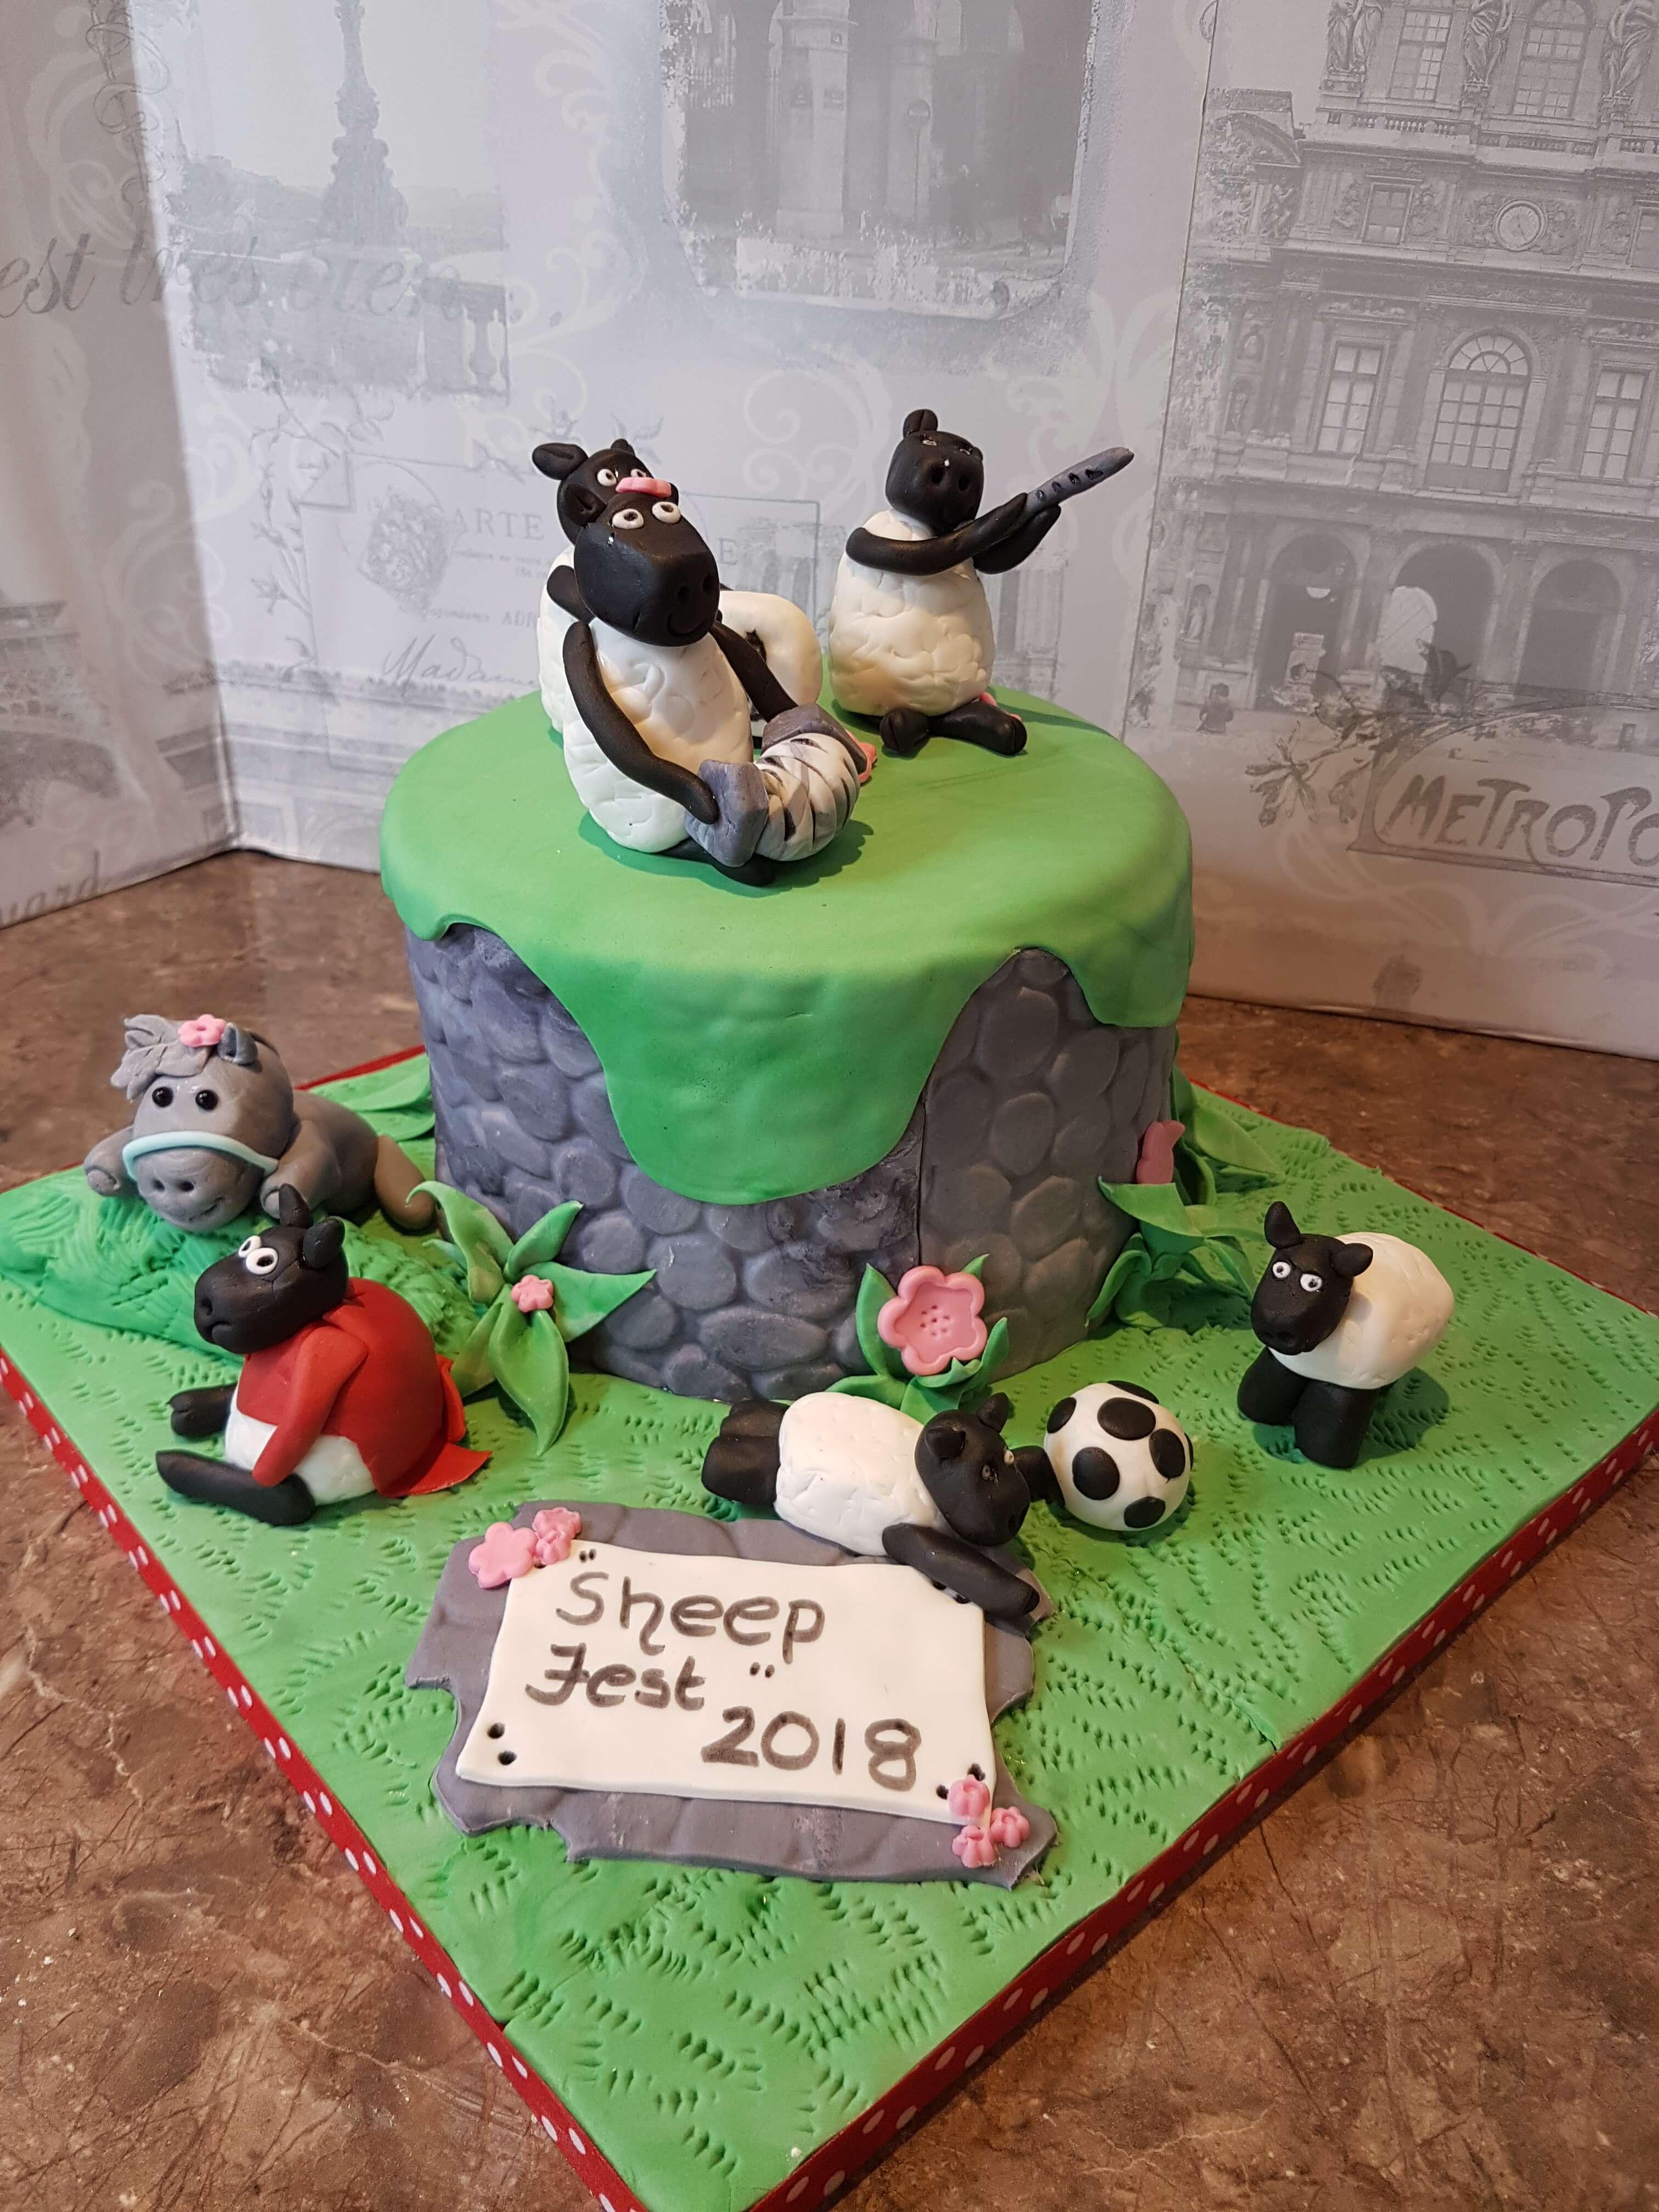 Celebrating SheepFest Baa-rilliant Cake